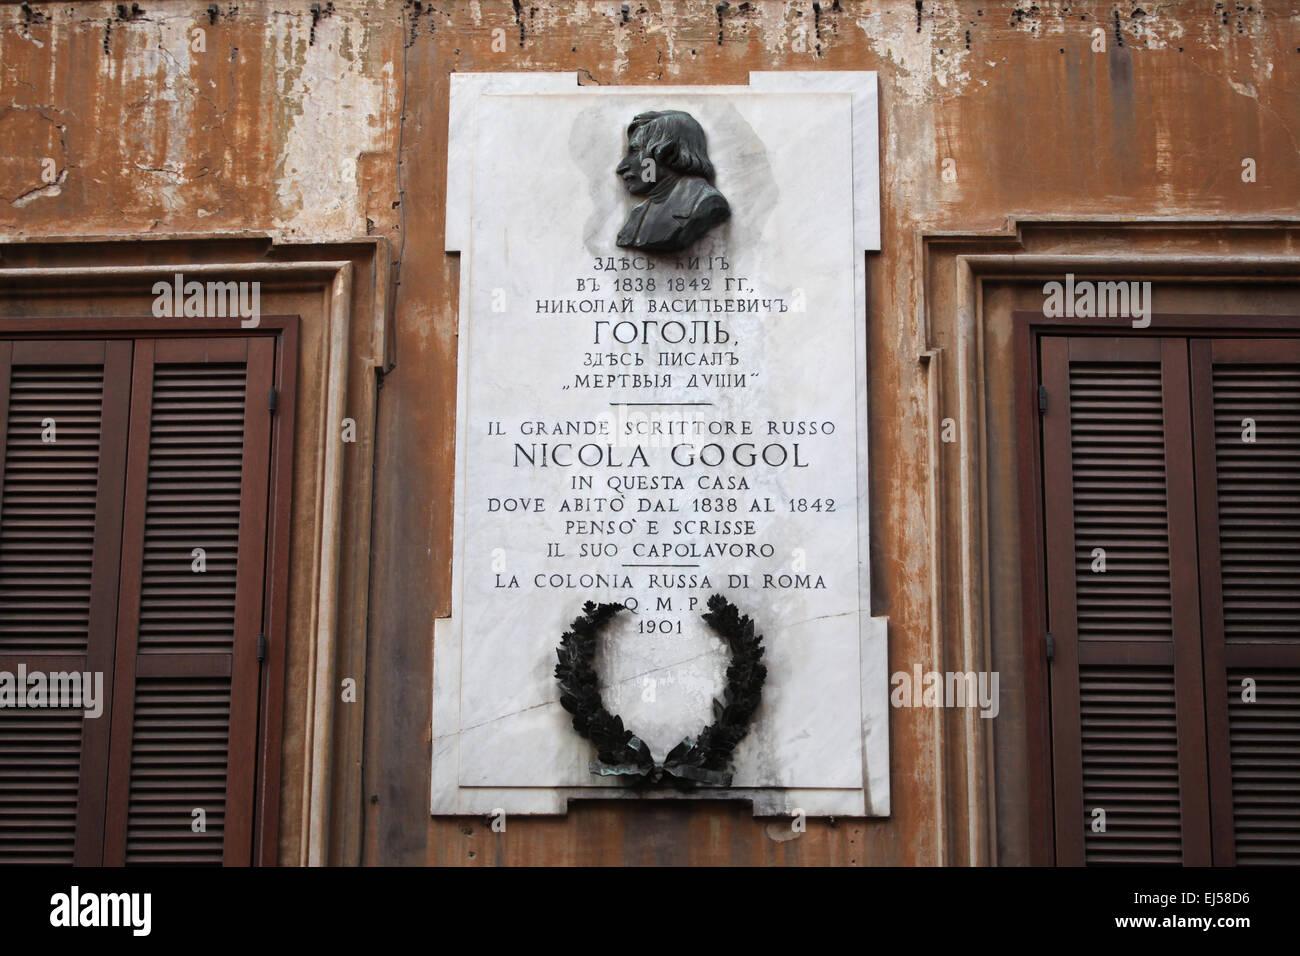 Commemorative plaque to Russian writer Nikolai Gogol at Via Sistina in Rome, Italy. Nikolai Gogol lived in this Stock Photo